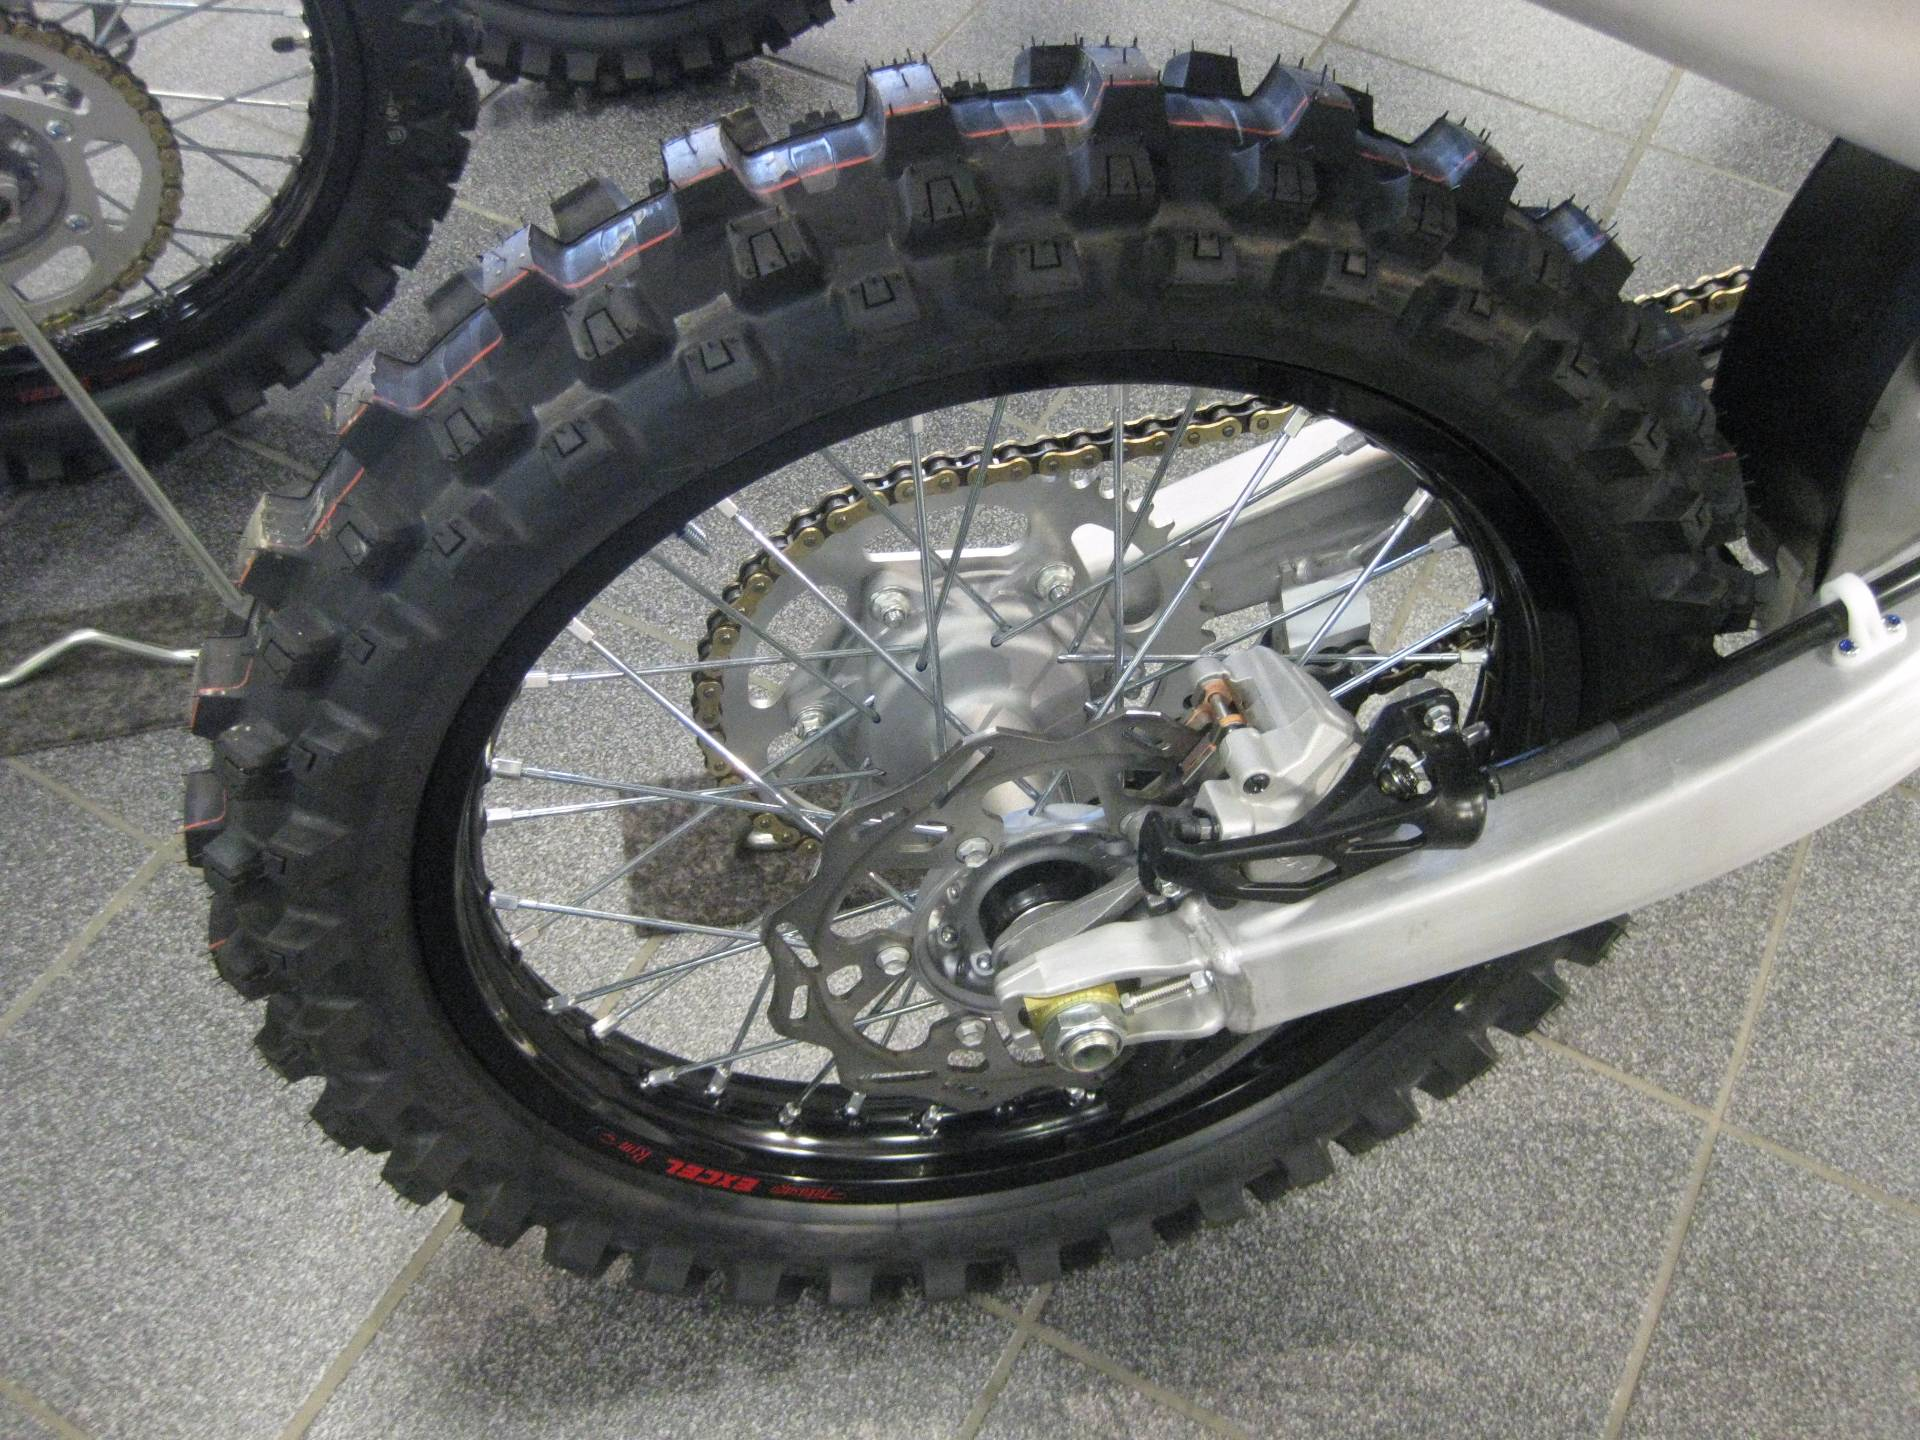 2017 Yamaha YZ450F in Wisconsin Rapids, Wisconsin